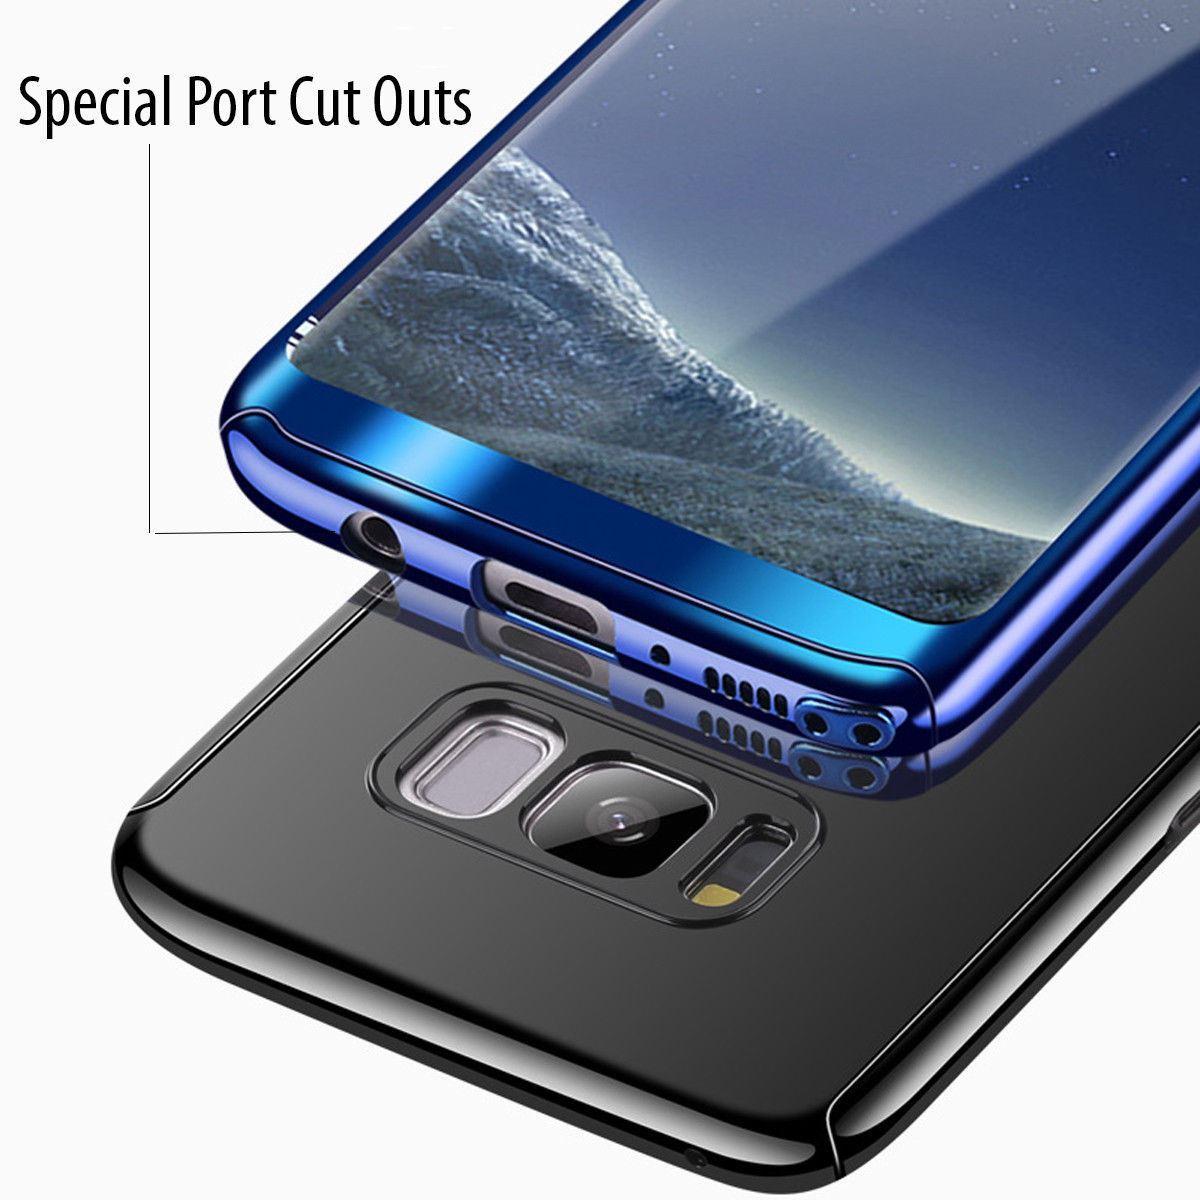 Shockproof-Hybrid-360-Ultra-Thin-Mirror-Hard-Case-Samsung-Galaxy-S7-edge-S8-S9 thumbnail 28